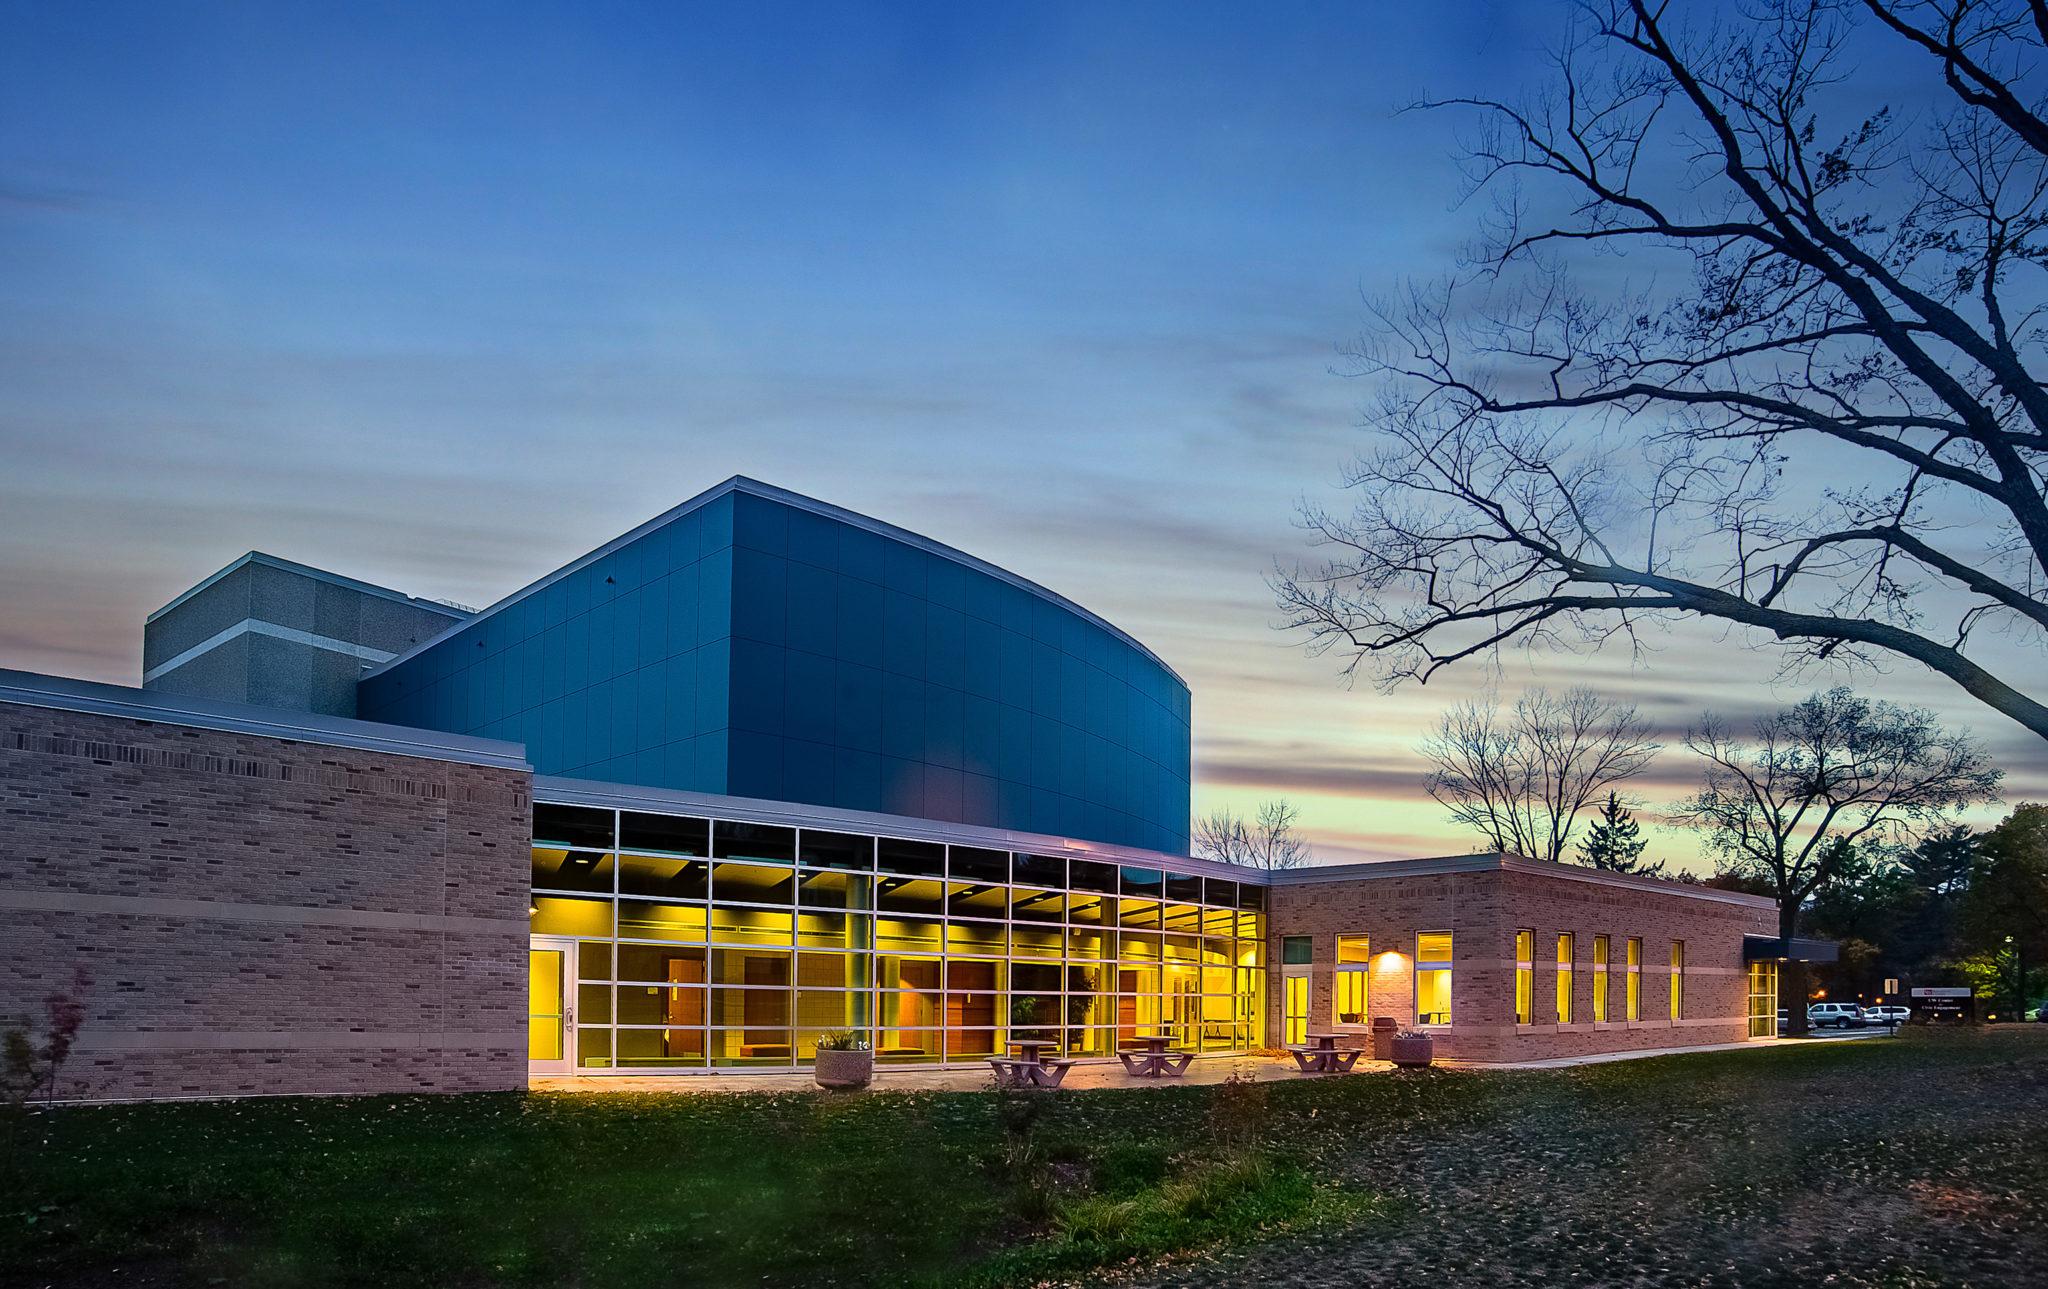 1_UWMC Center for Civic Engagement